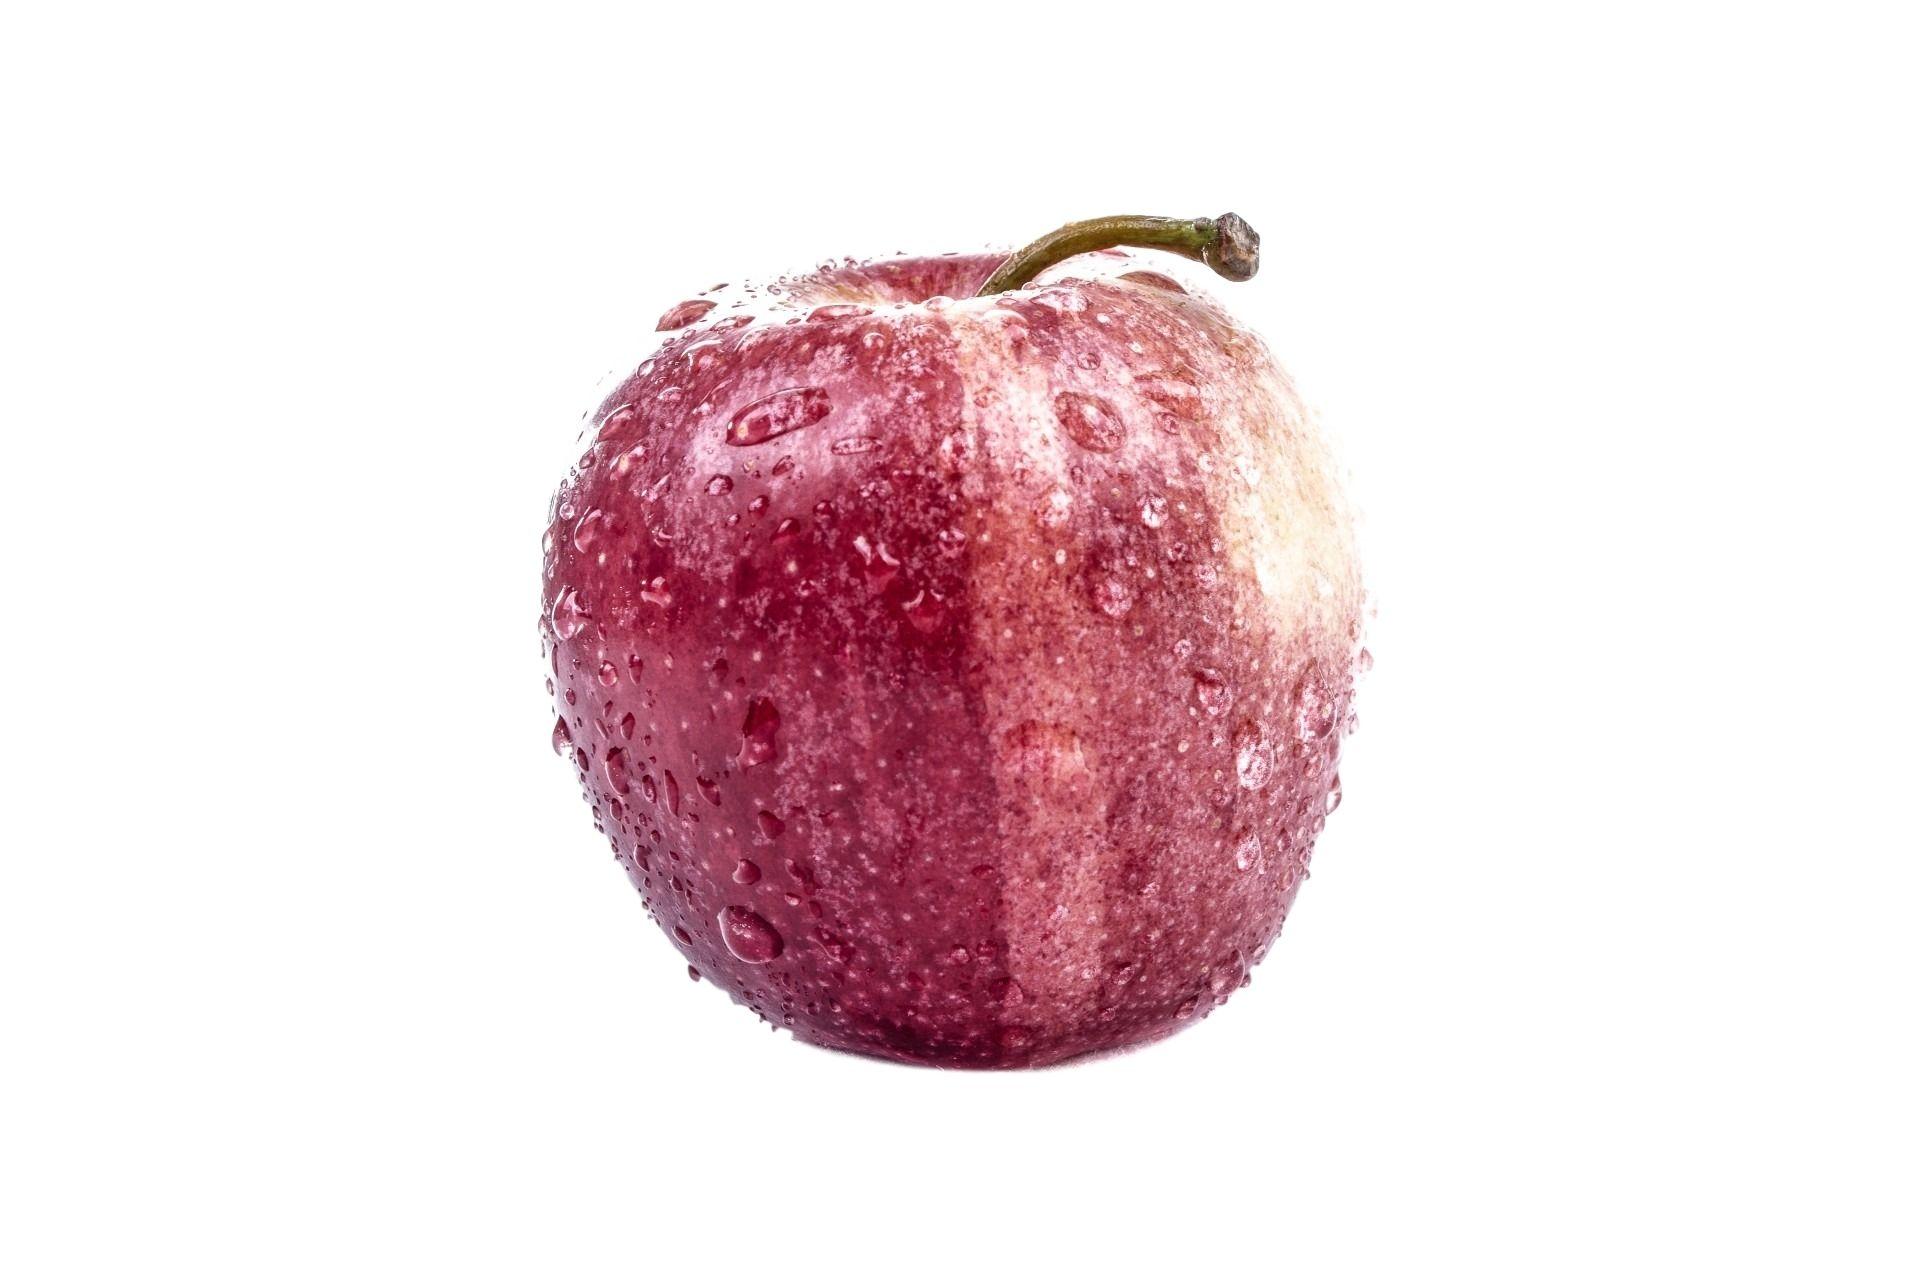 Eat 5 vegetables and fruits a day __________________________________________________ #fruits #fruitsalad #freshfruits #fruitsandveggies #organic #organicfood #healthy #health #green #fresh #refreshing #delicious #fruit ##apple #pineapple #banana #strawberry #kiwi #manga #orange #blueberry #peach #melon #grapes #love #sweet #picoftheday #photooftheday #bestoftheday #pictureoftheday